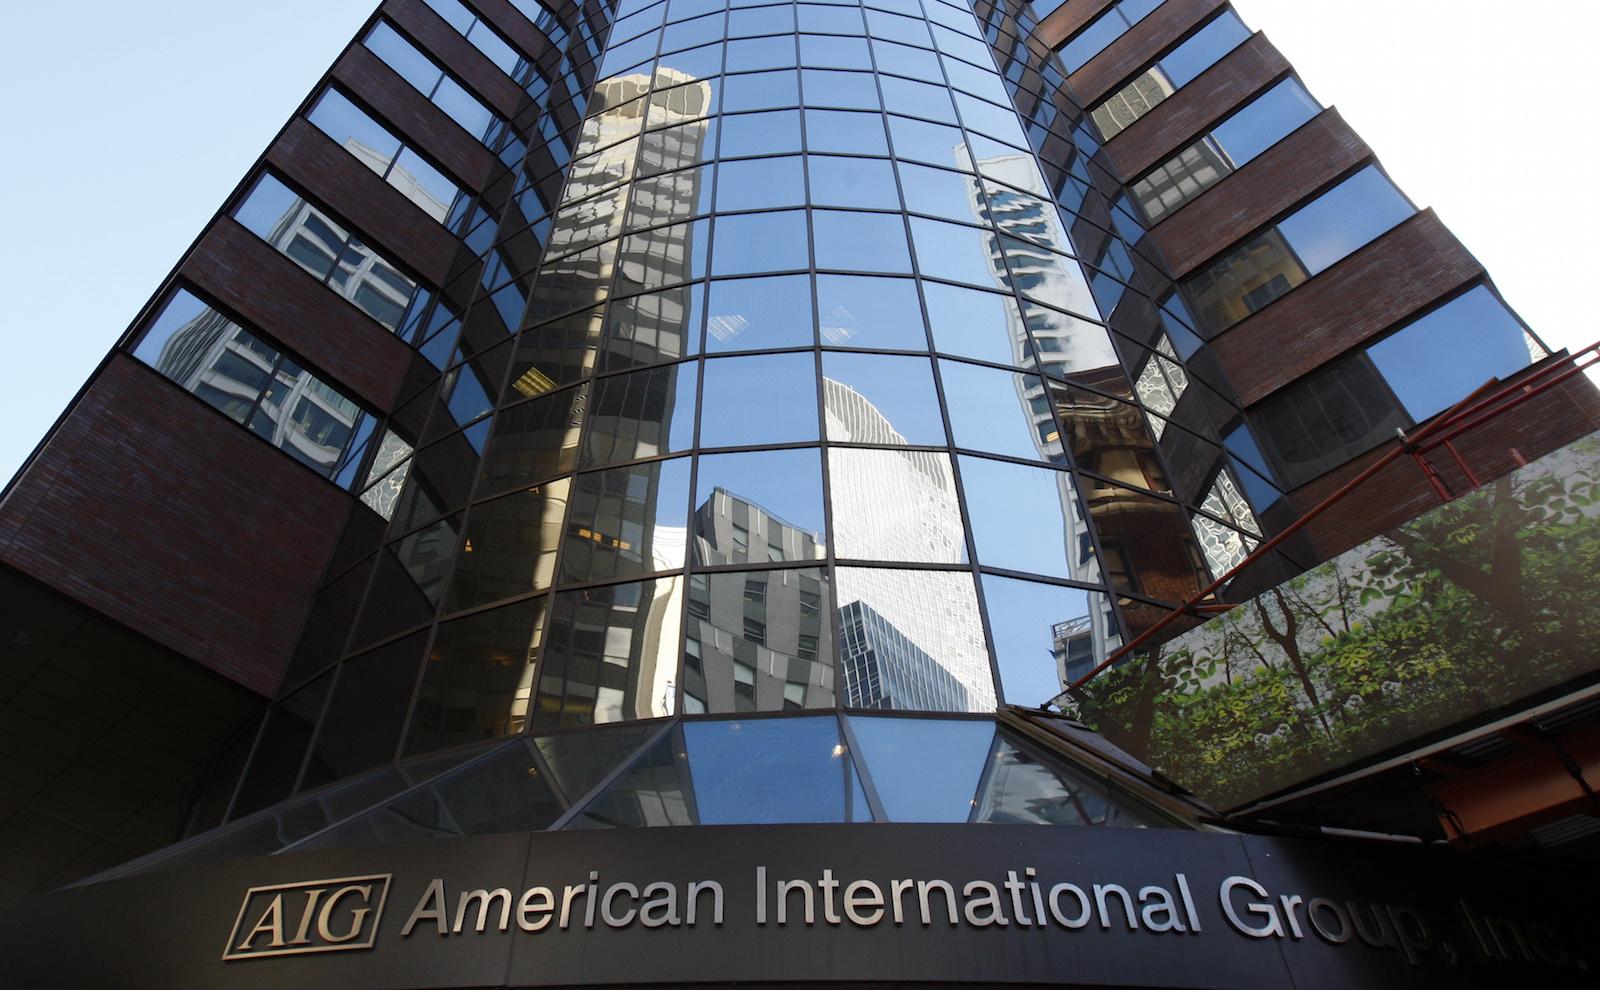 American International Group Inc. (AIG) corporate headquarters in New York, November 10, 2008.     REUTERS/Mike Segar   (UNITED STATES) - RTXAGJE